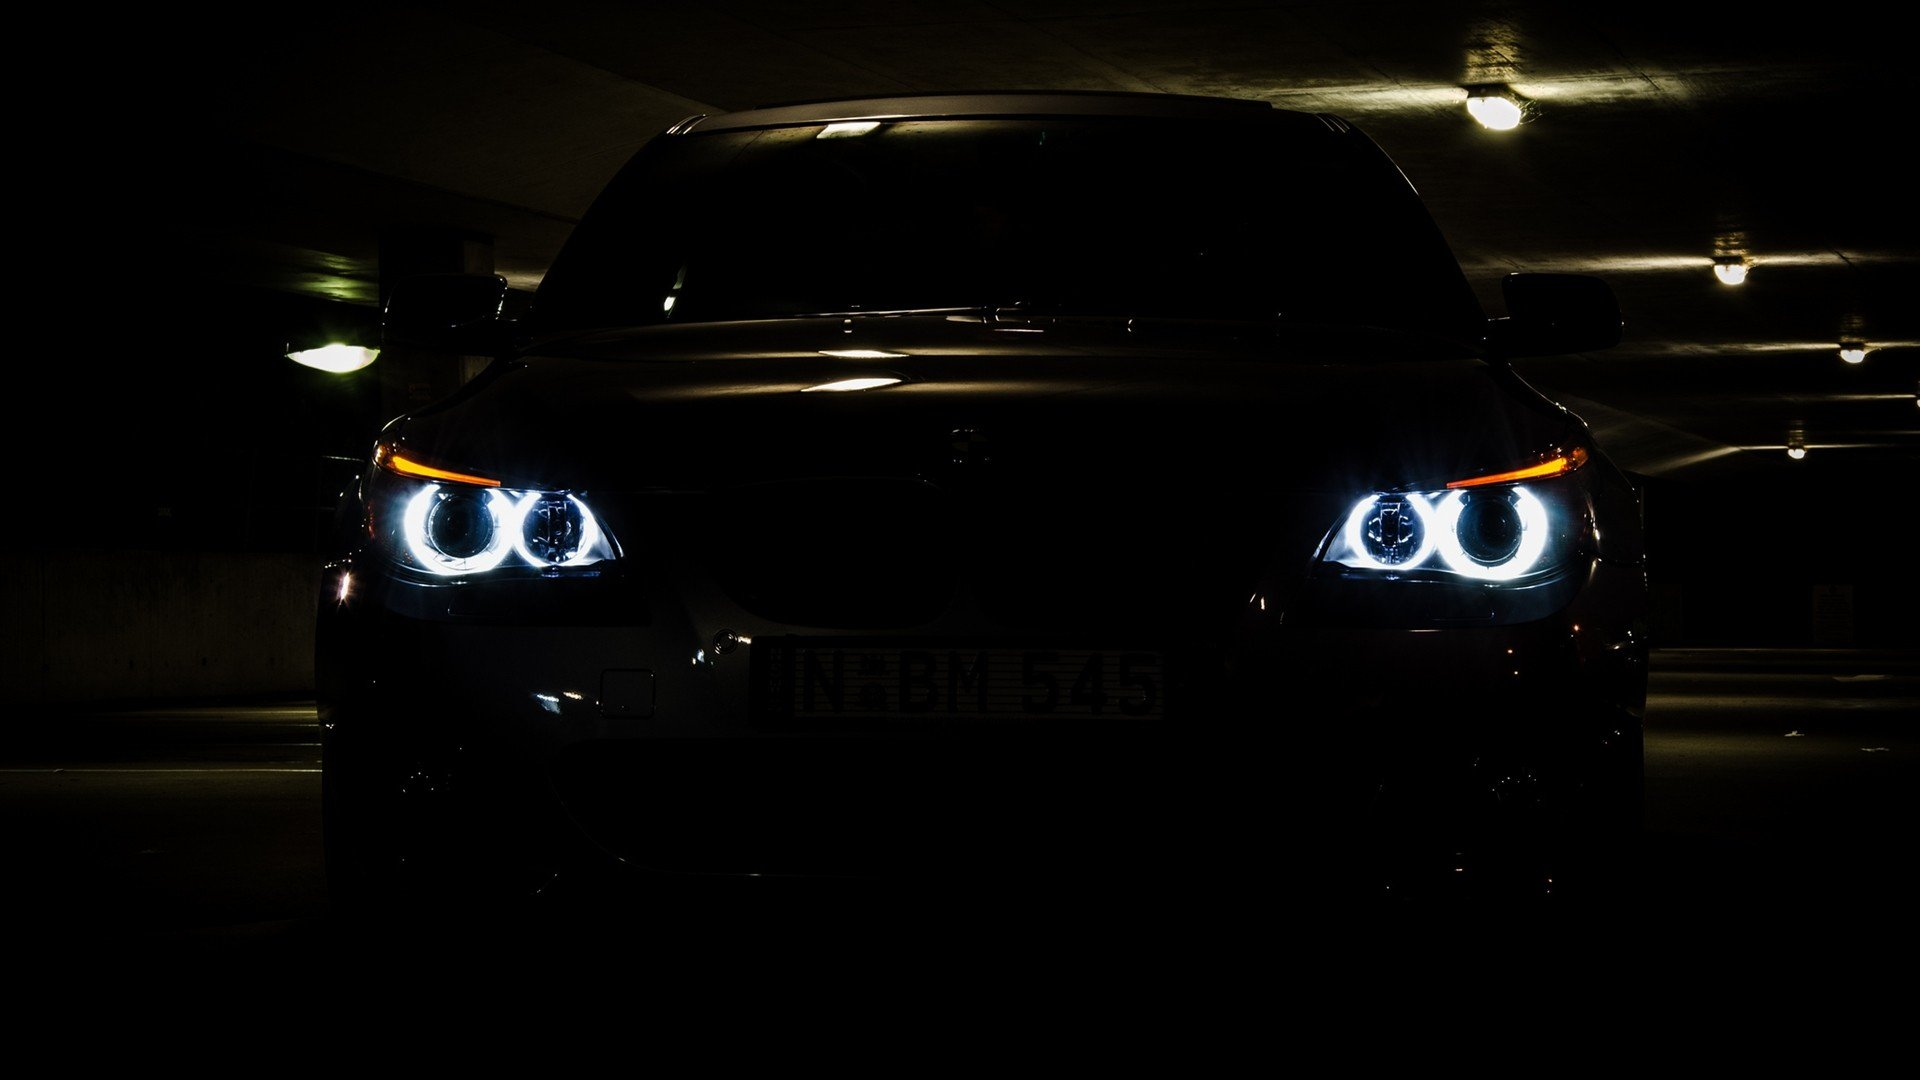 bmw lights cars vehicles bmw 5 series bmw e60 automobile. Black Bedroom Furniture Sets. Home Design Ideas